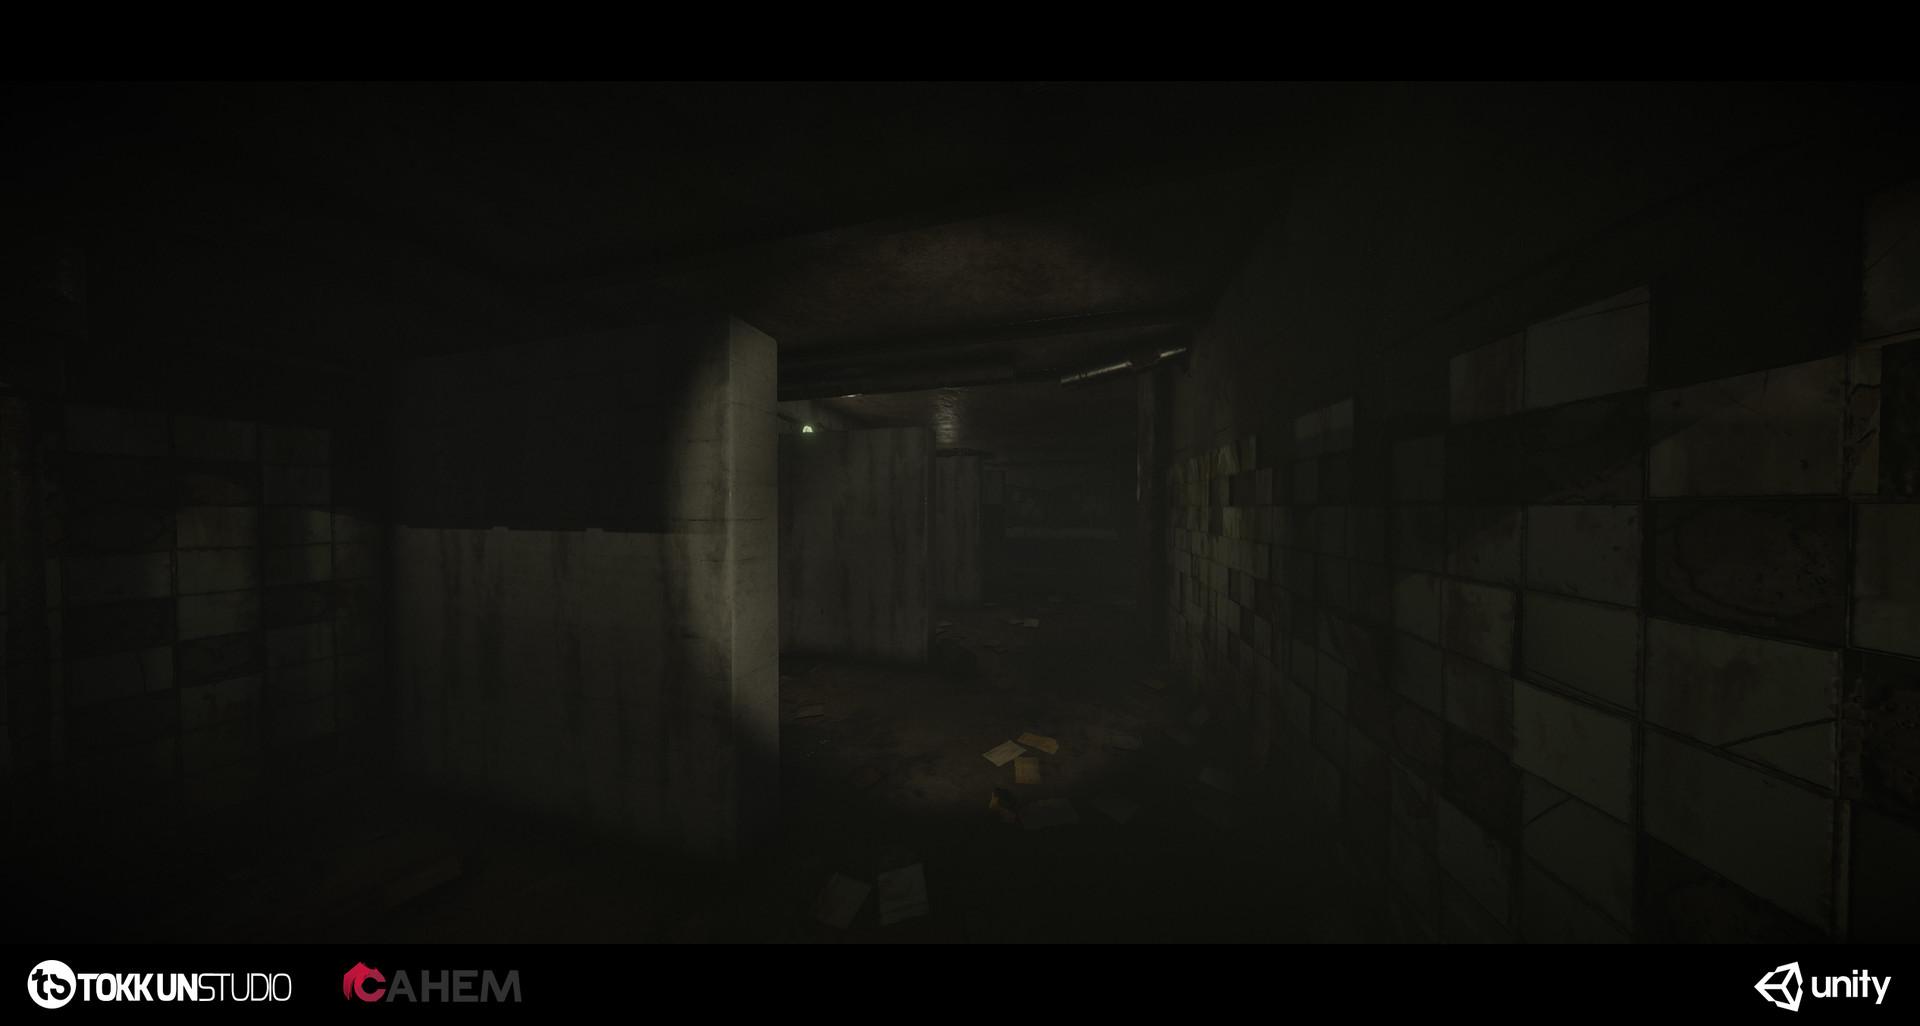 Tokkun studio bunker shot 29